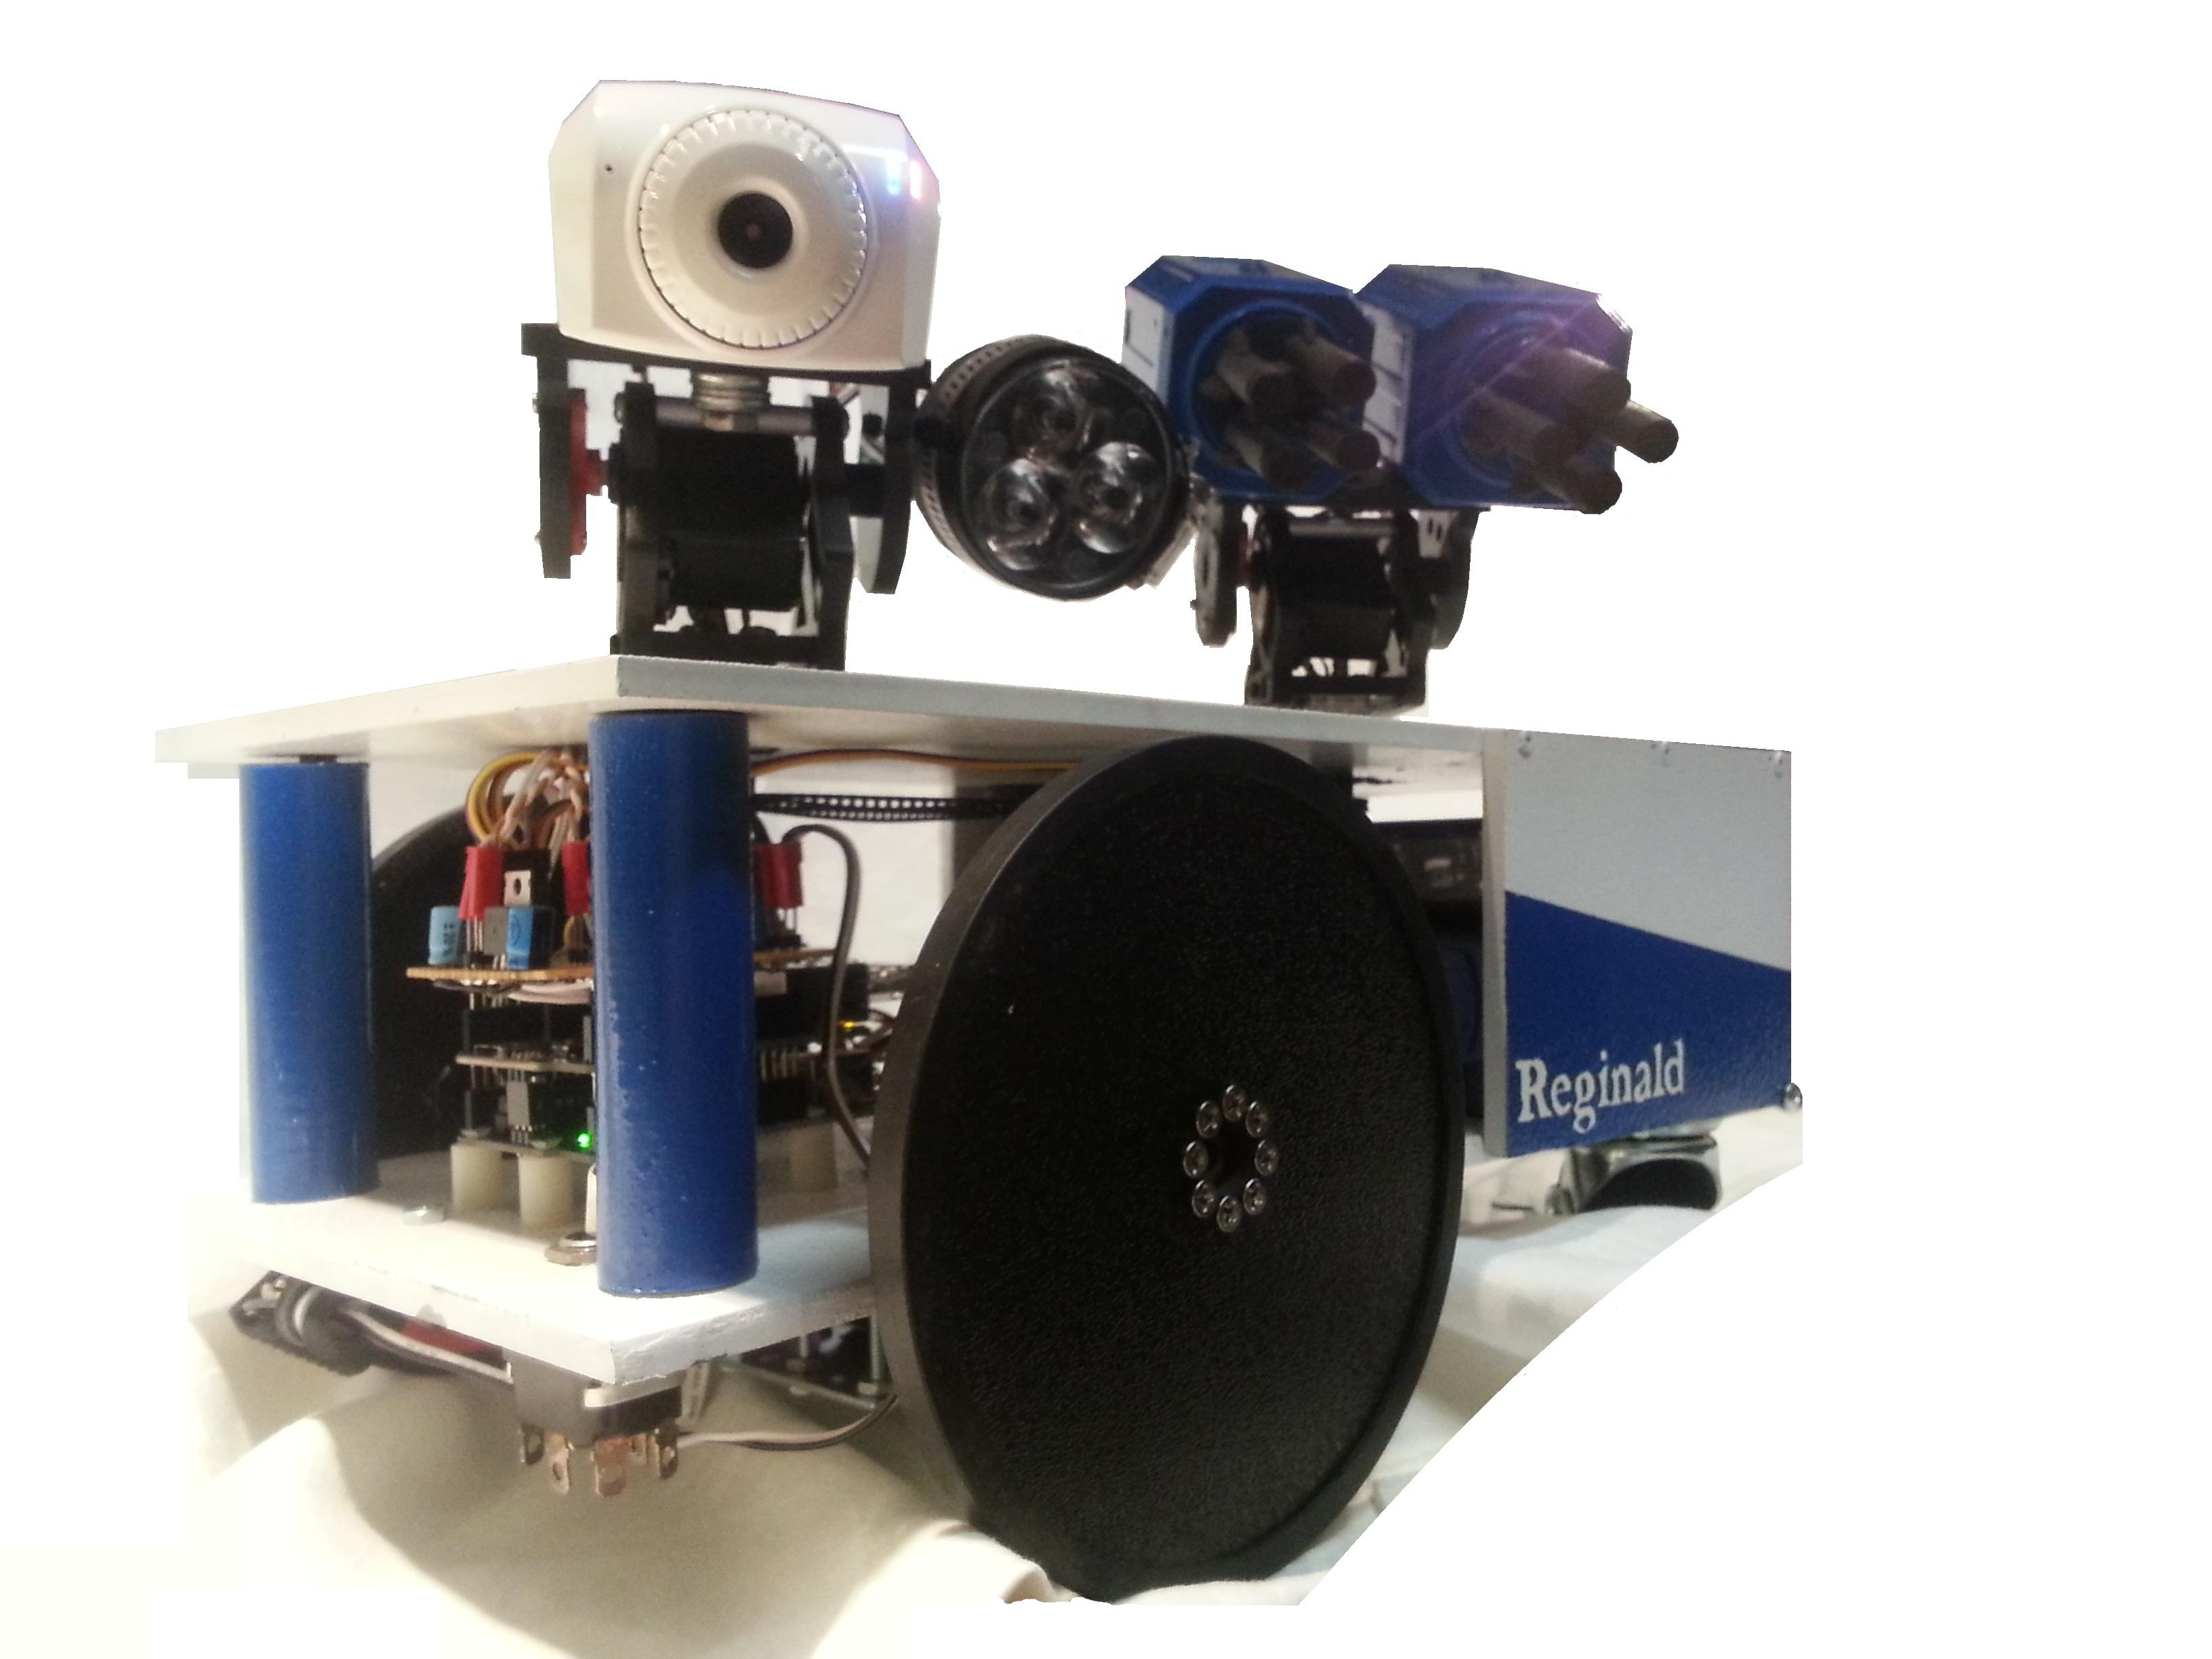 Reginald: a UDP surveillance bot; control via the Internet